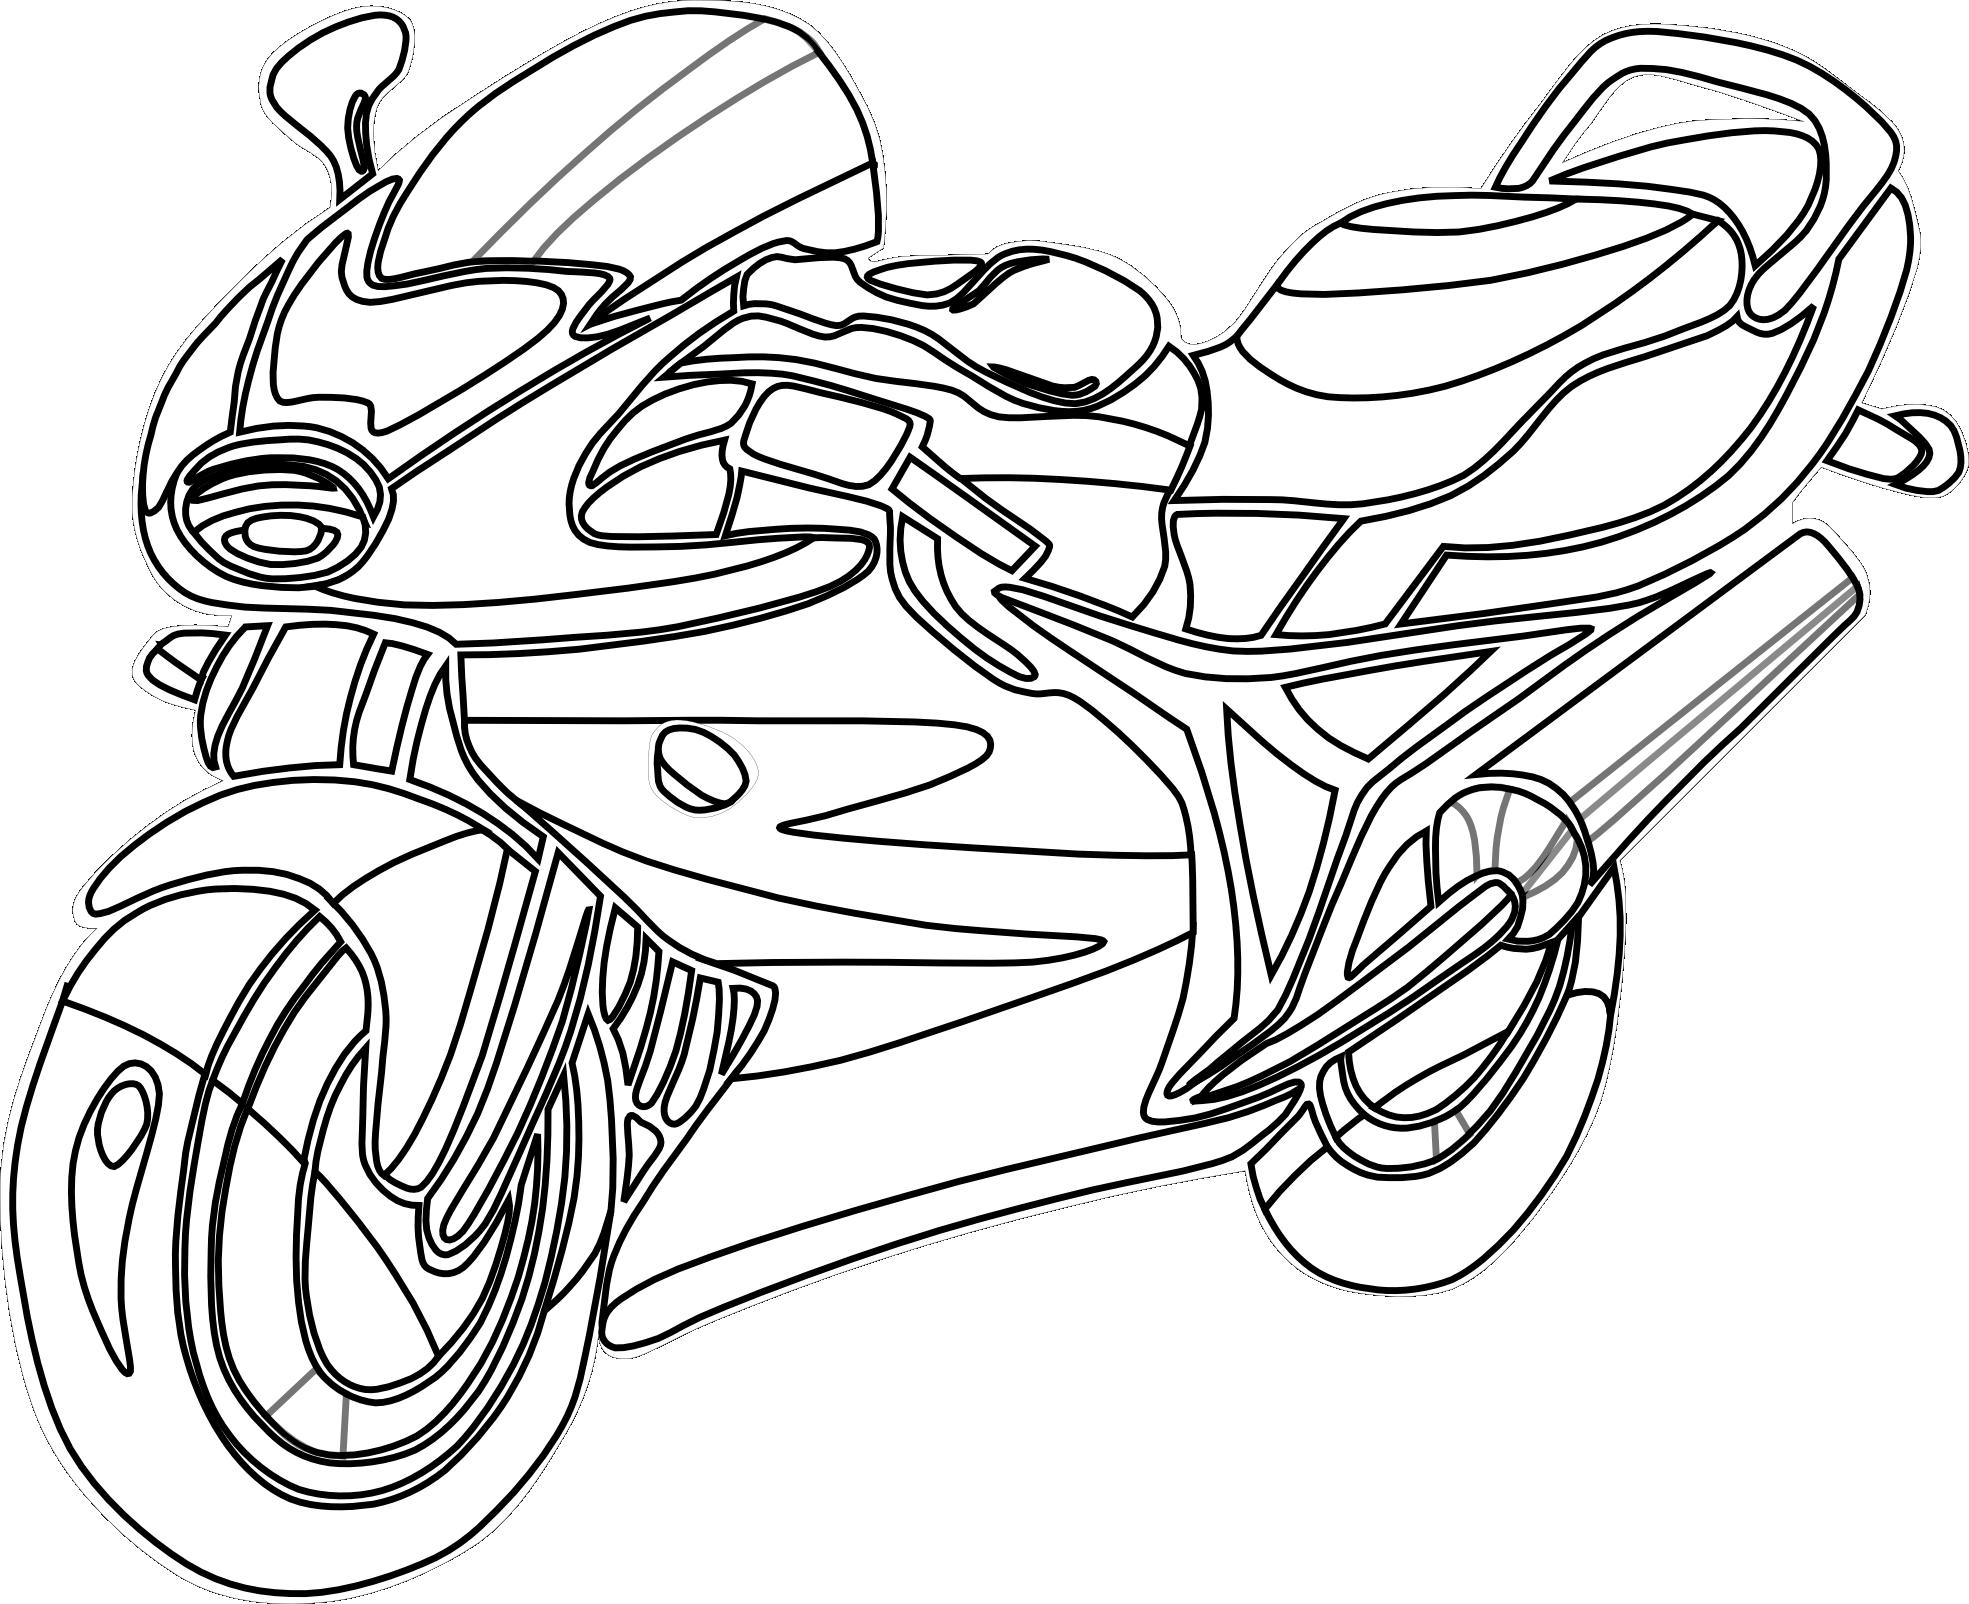 Motorcycle coloring #15, Download drawings